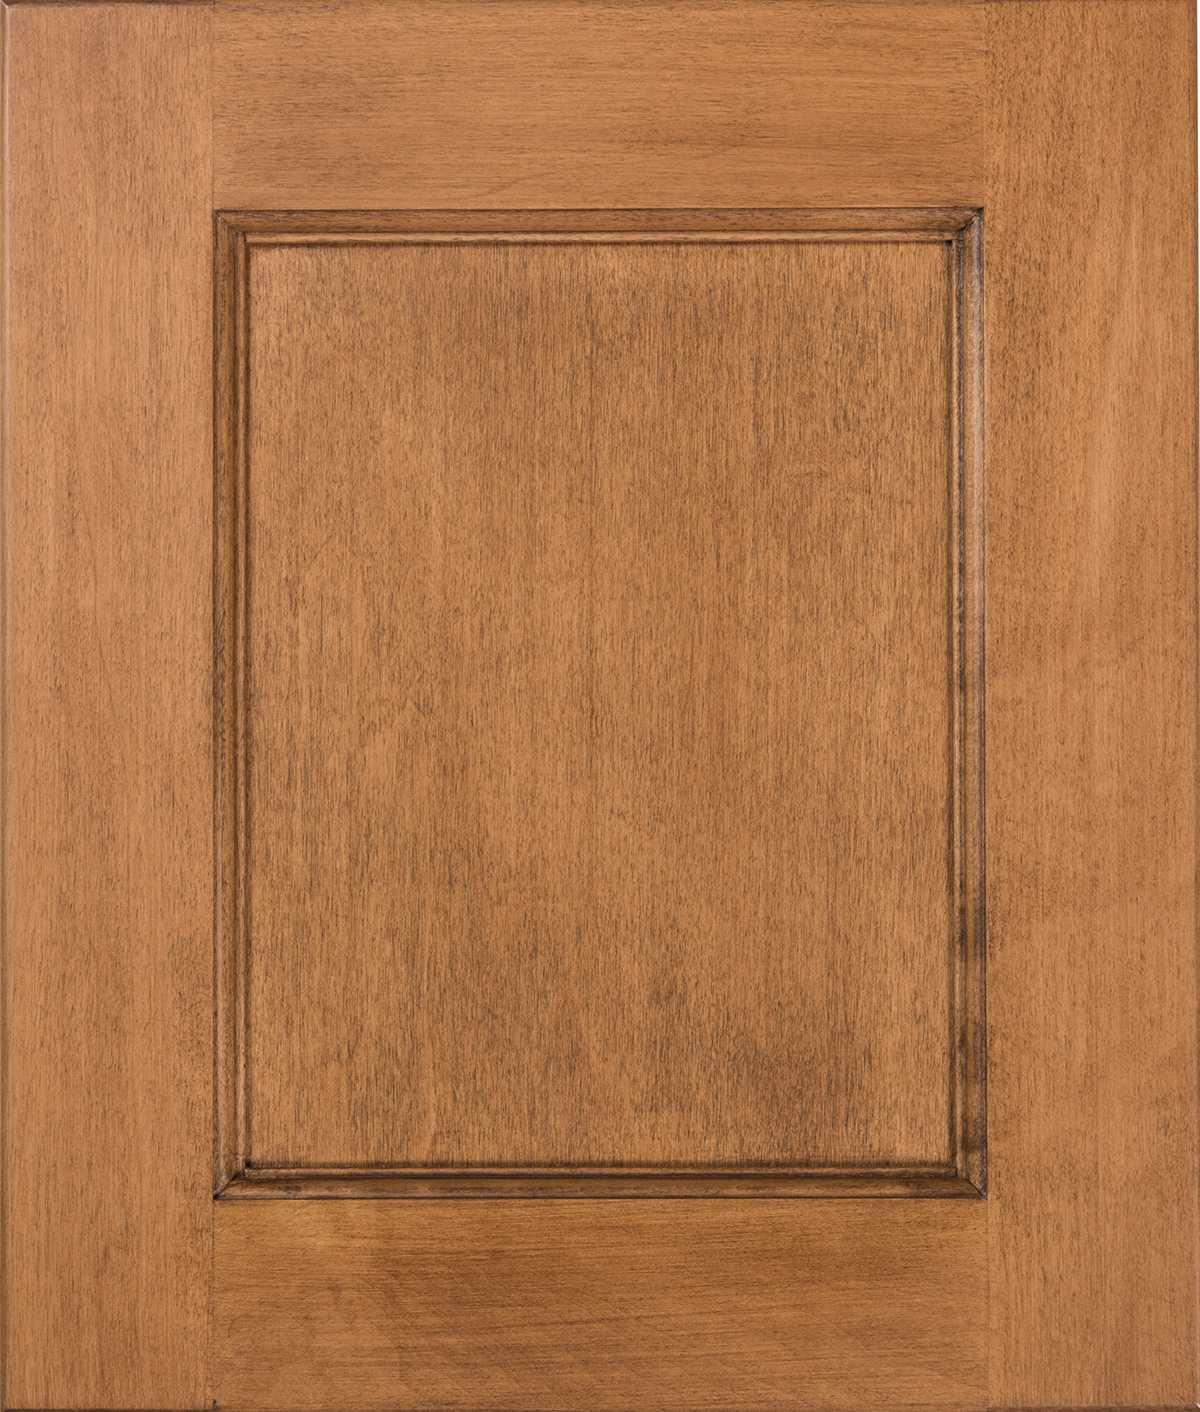 Flat Panel -Square _SFP-HDM-07